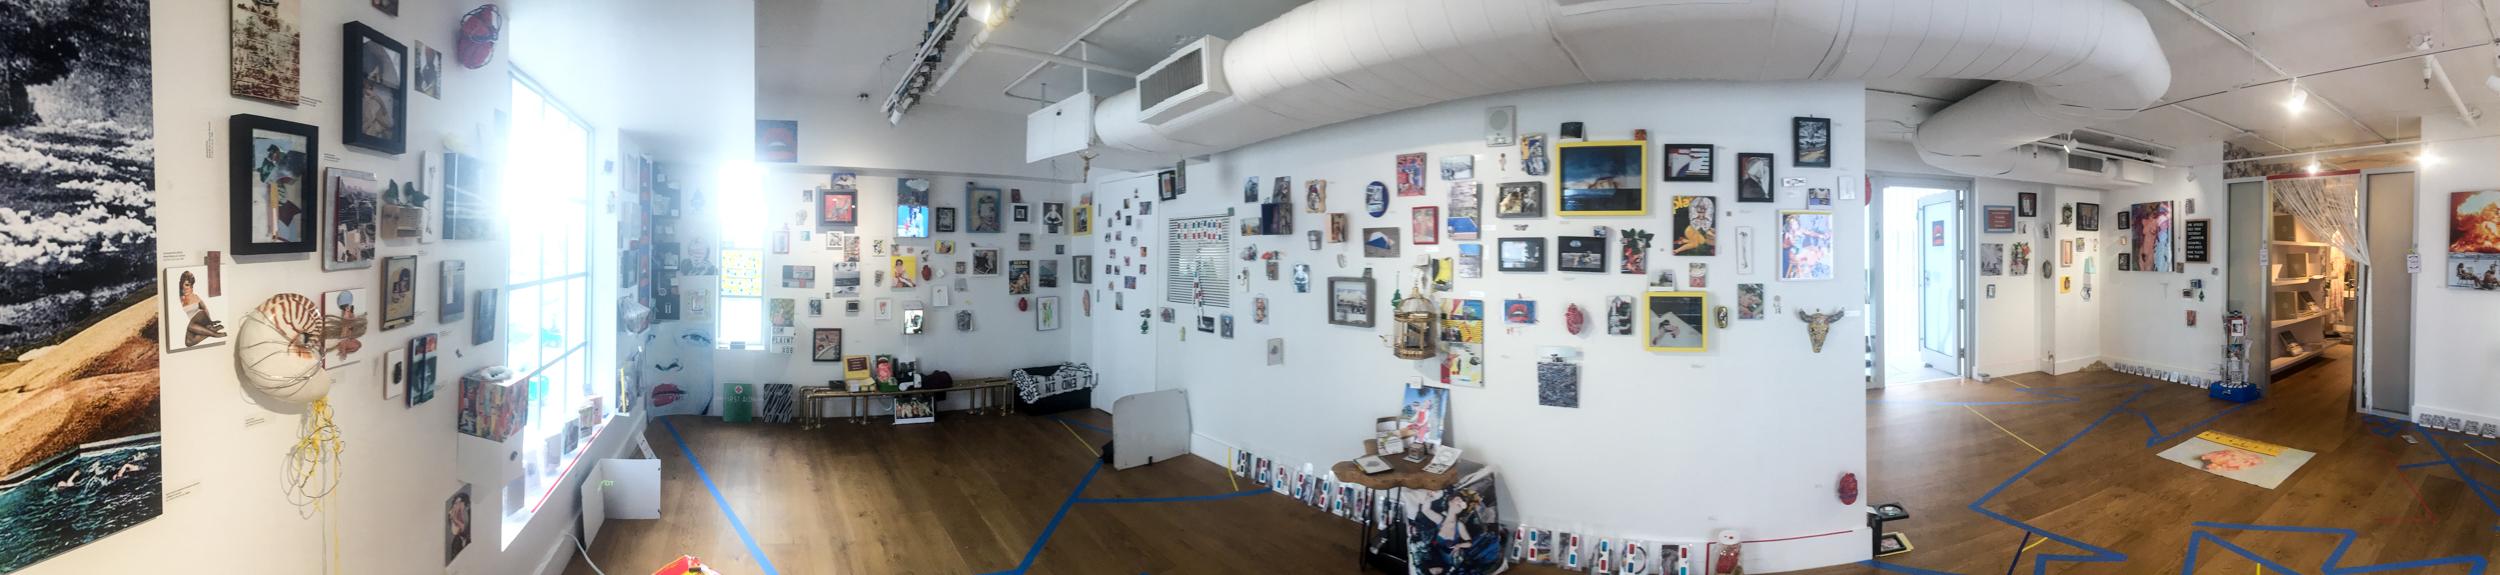 Faena-Exhibition-Images-2.jpg